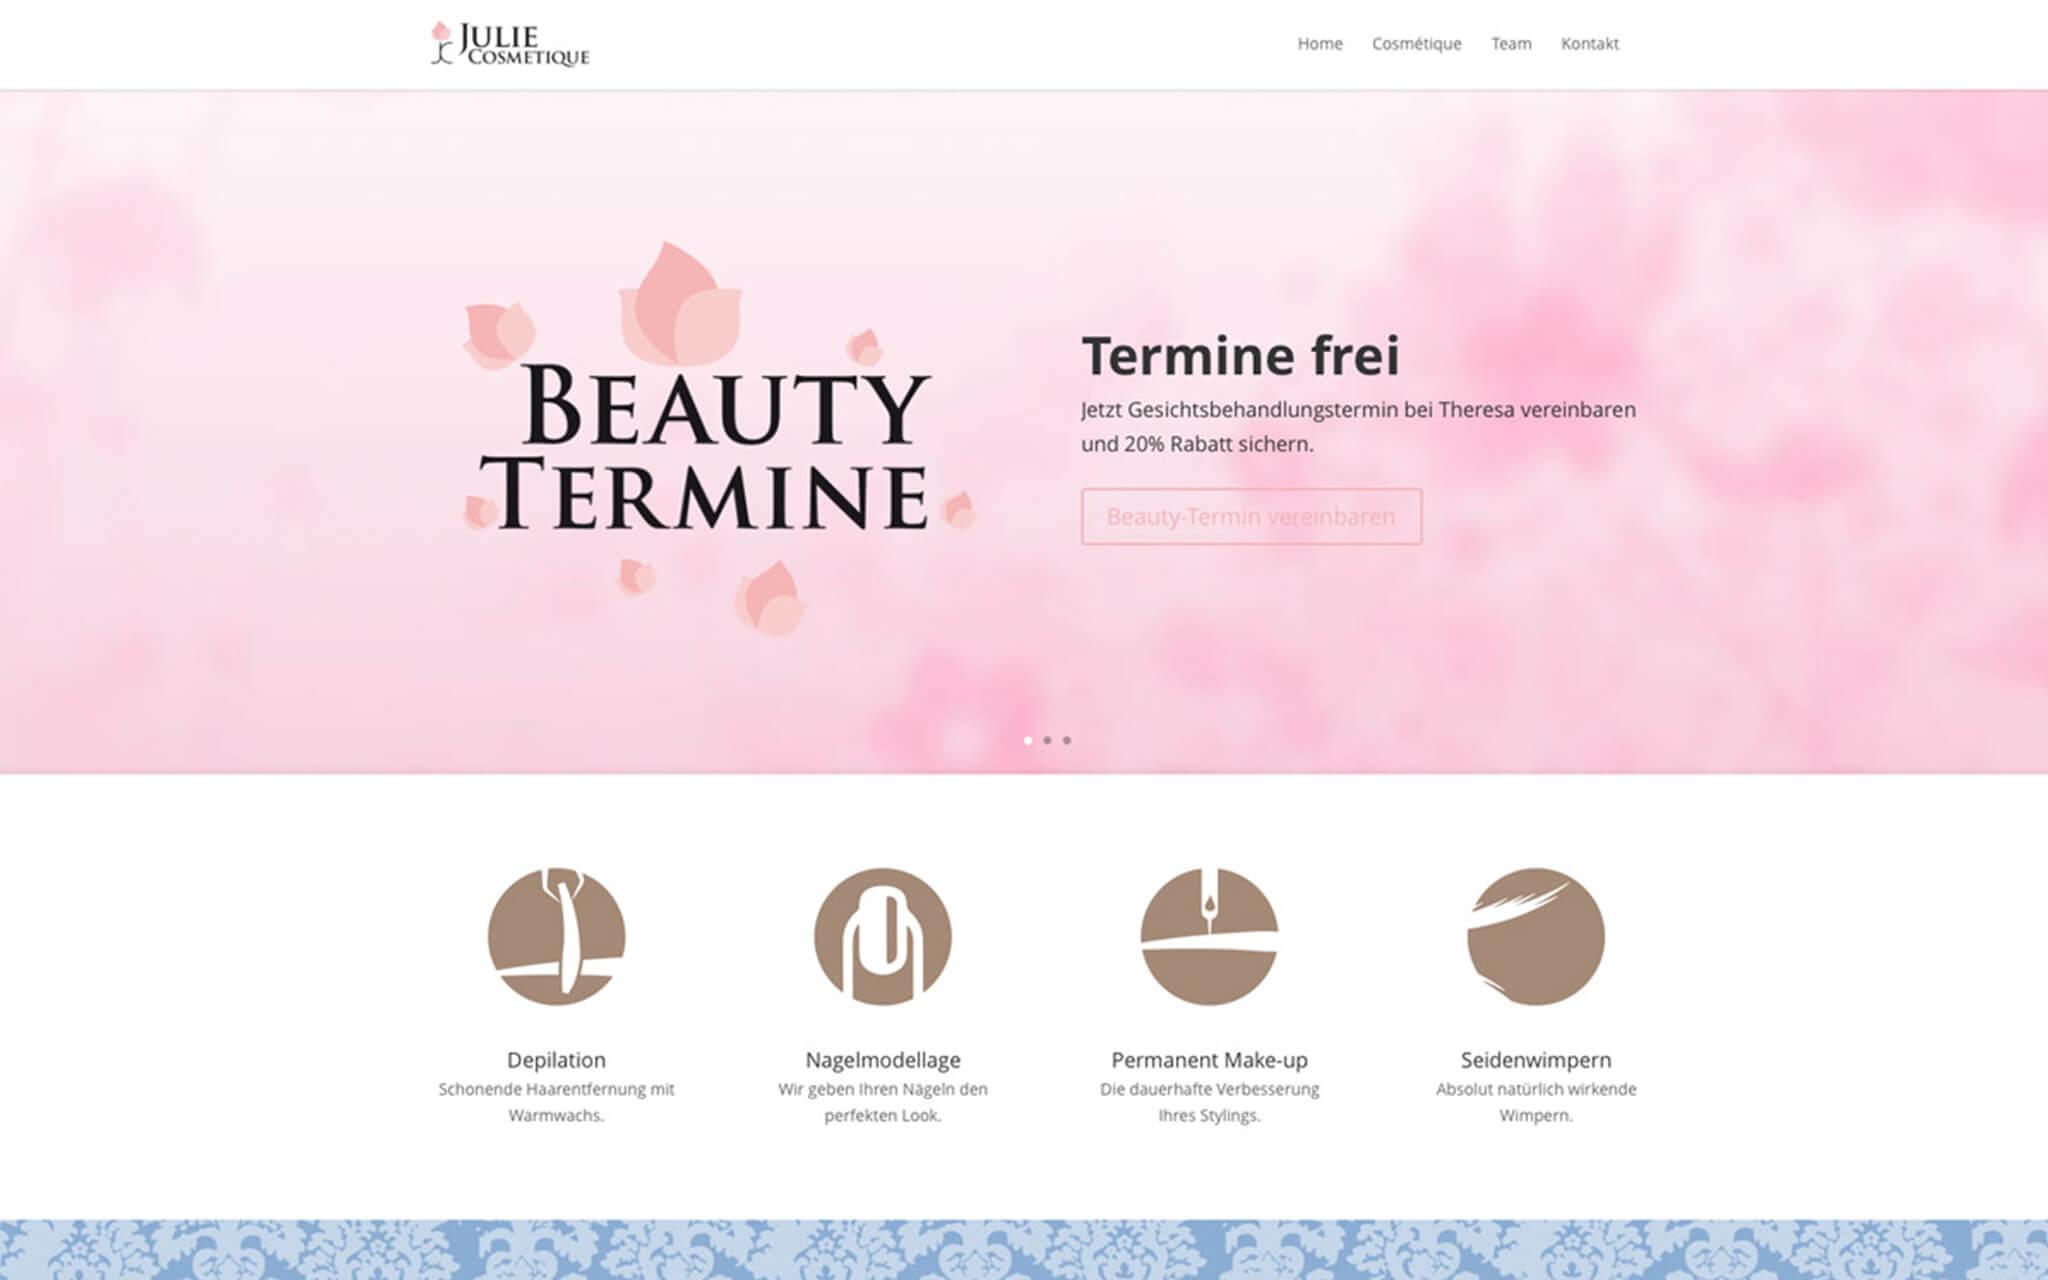 mediarock-cosmetique-julie-website